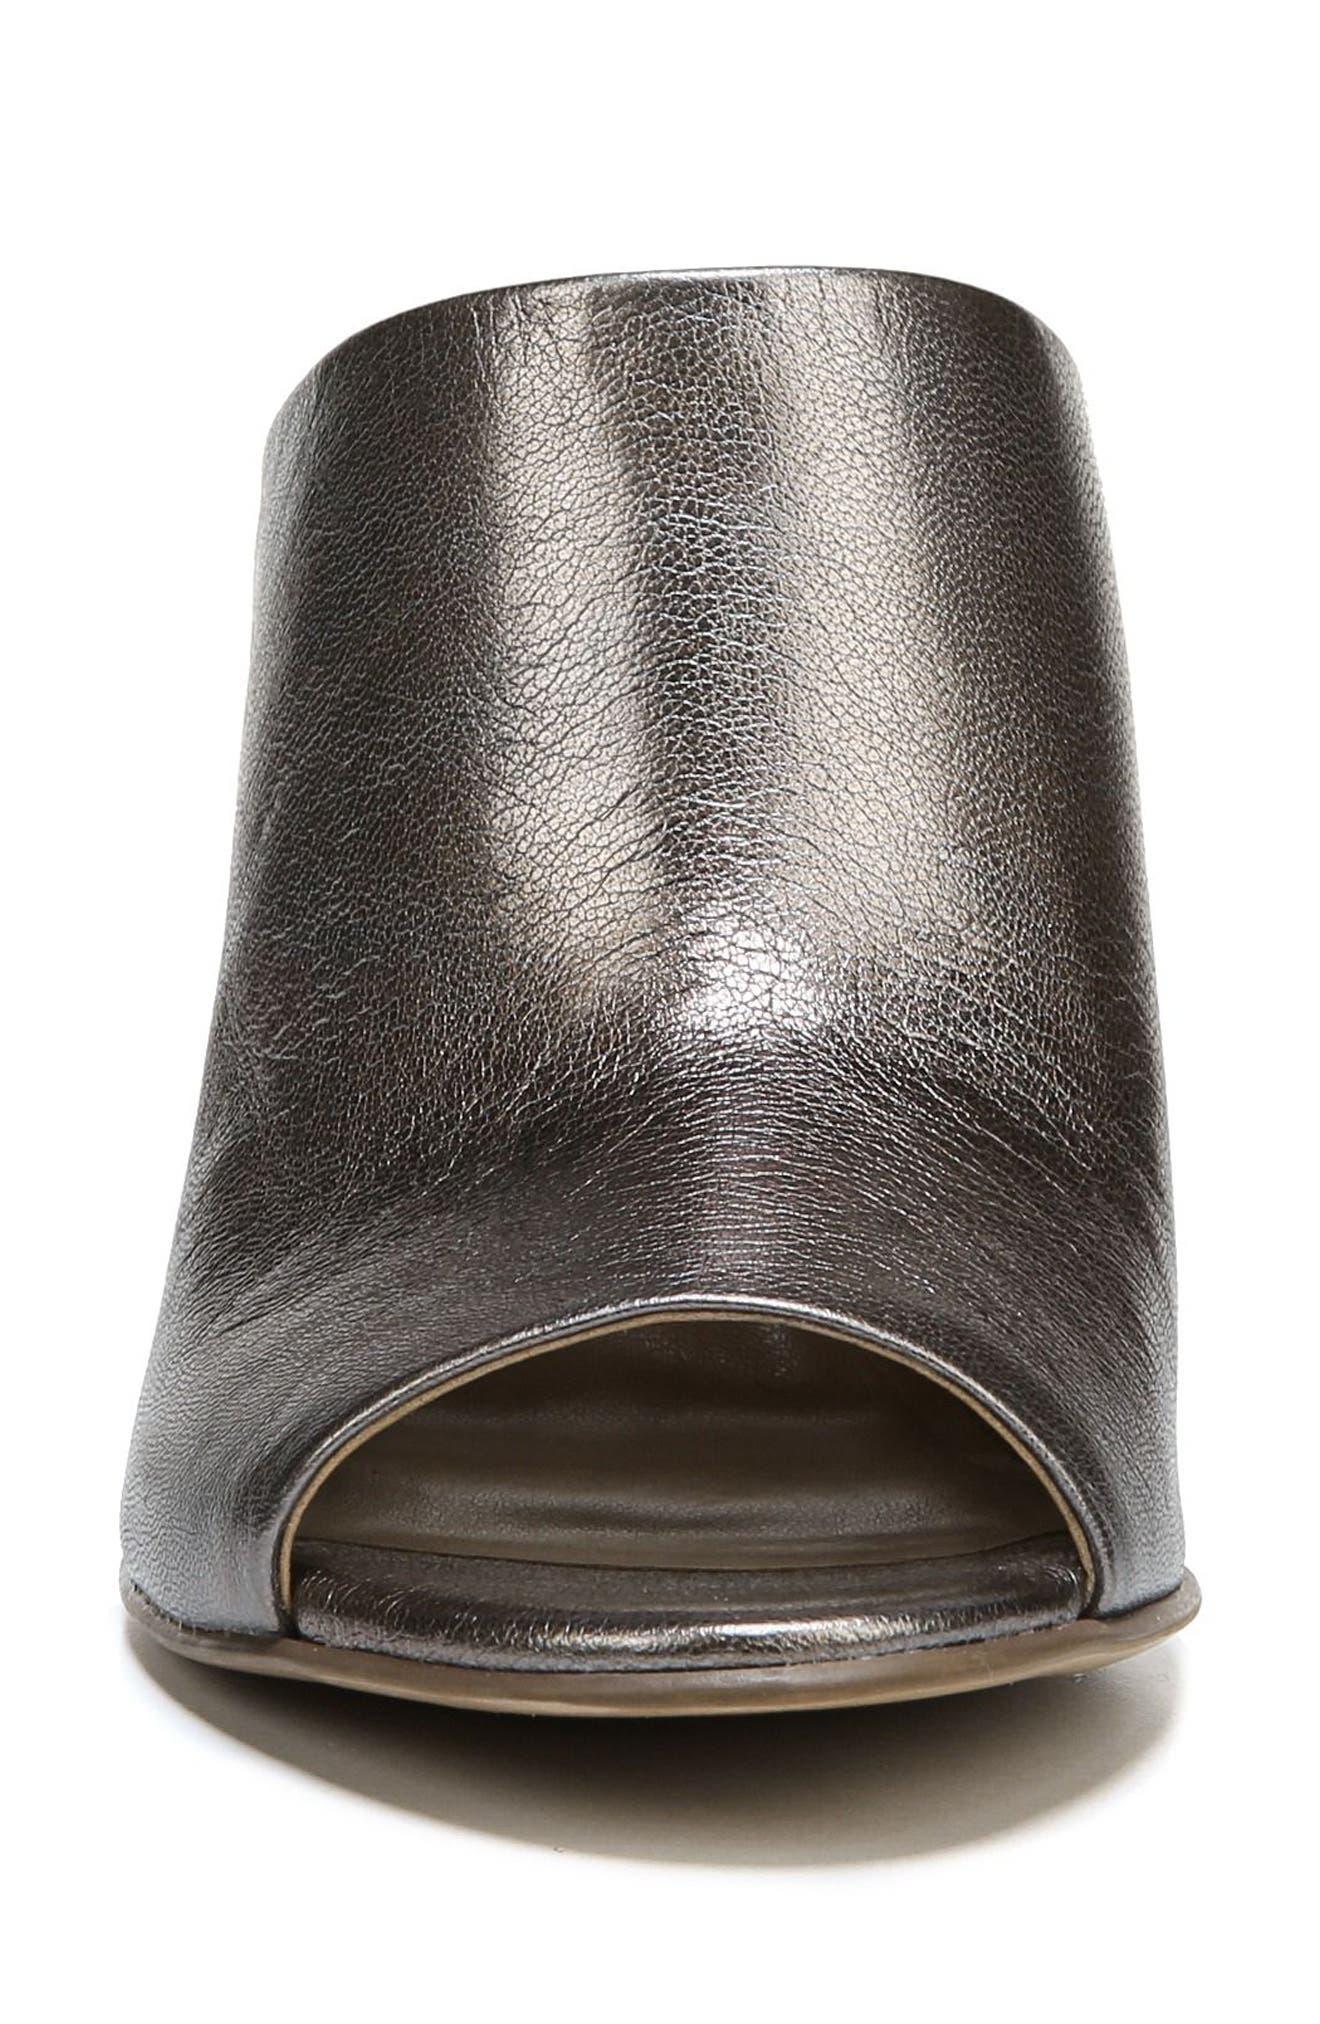 Sloan Sandal,                             Alternate thumbnail 4, color,                             Gunmetal Leather